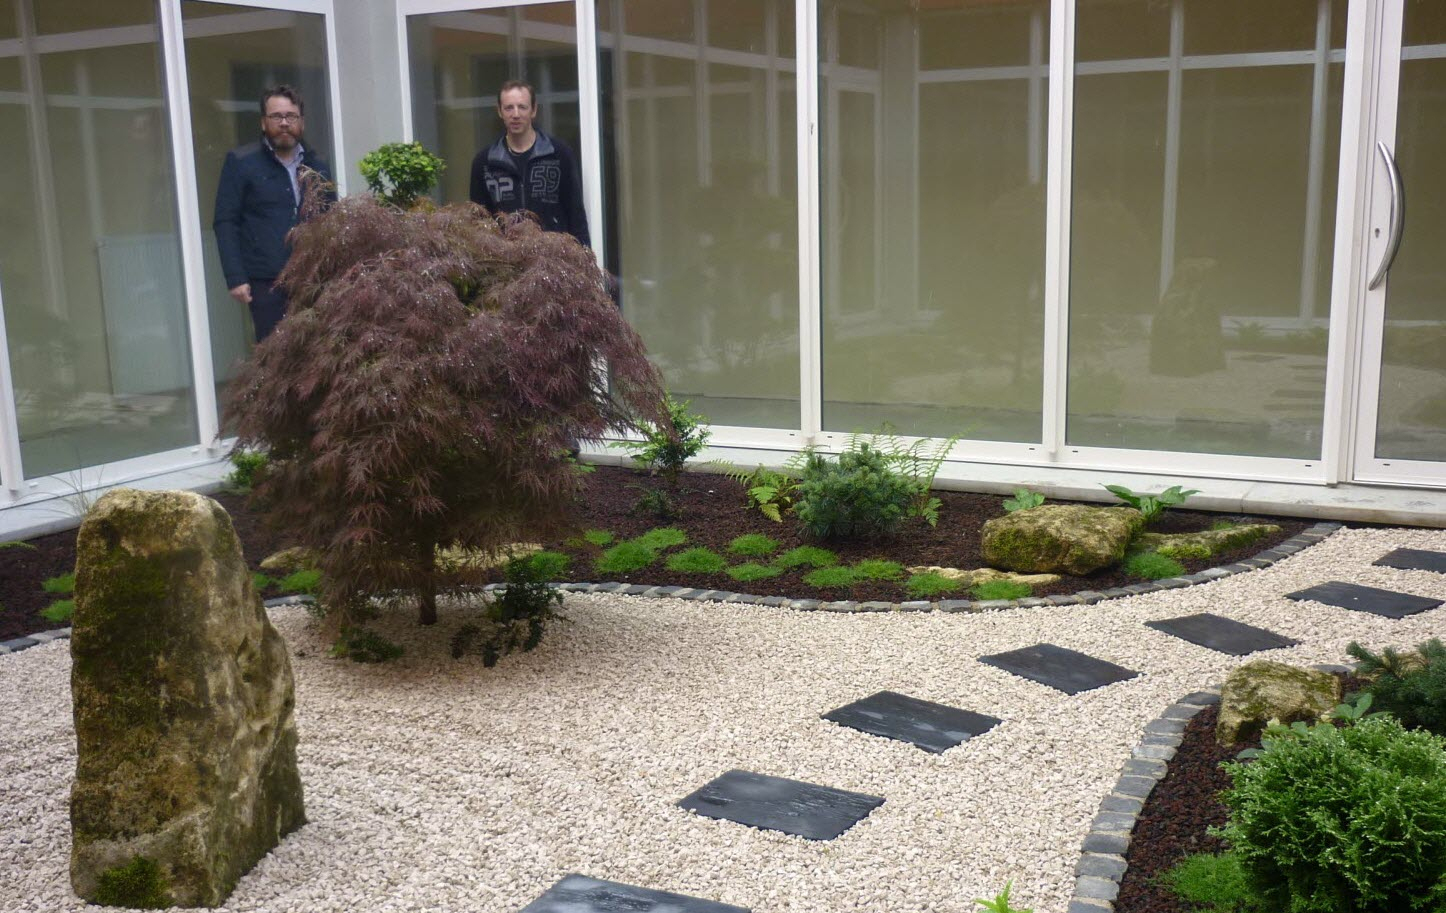 Modele De Jardin Japonais - Prefierofernandez pour Modele Jardin Japonais